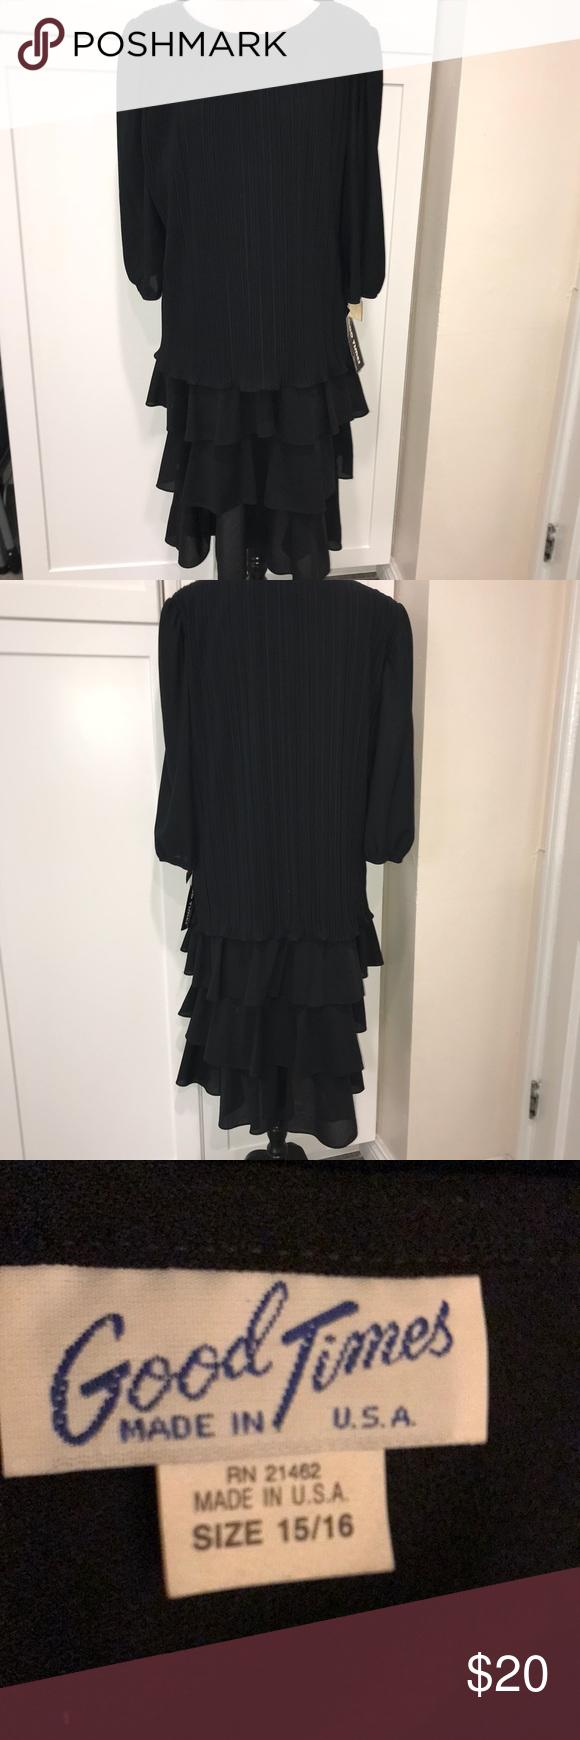 3 4 Sleeve Black Dress Ruffled At Bottom Black Dress With Sleeves Black Dress Layering Ruffle Dress [ 1740 x 580 Pixel ]